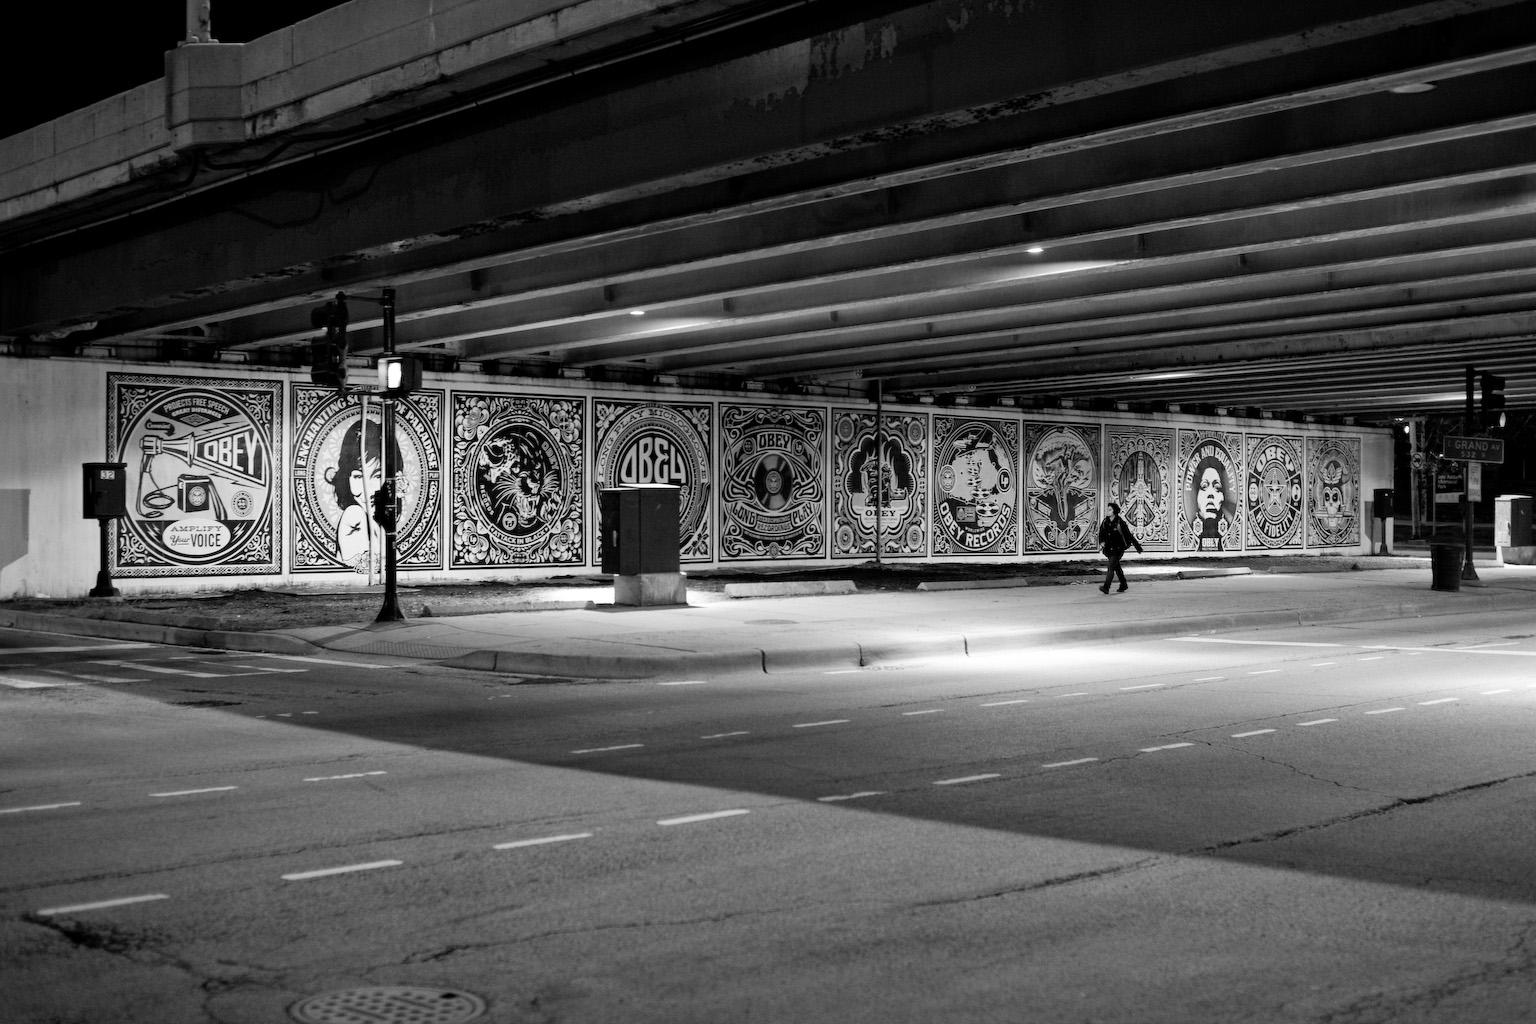 Monochrome Mural Wall Art